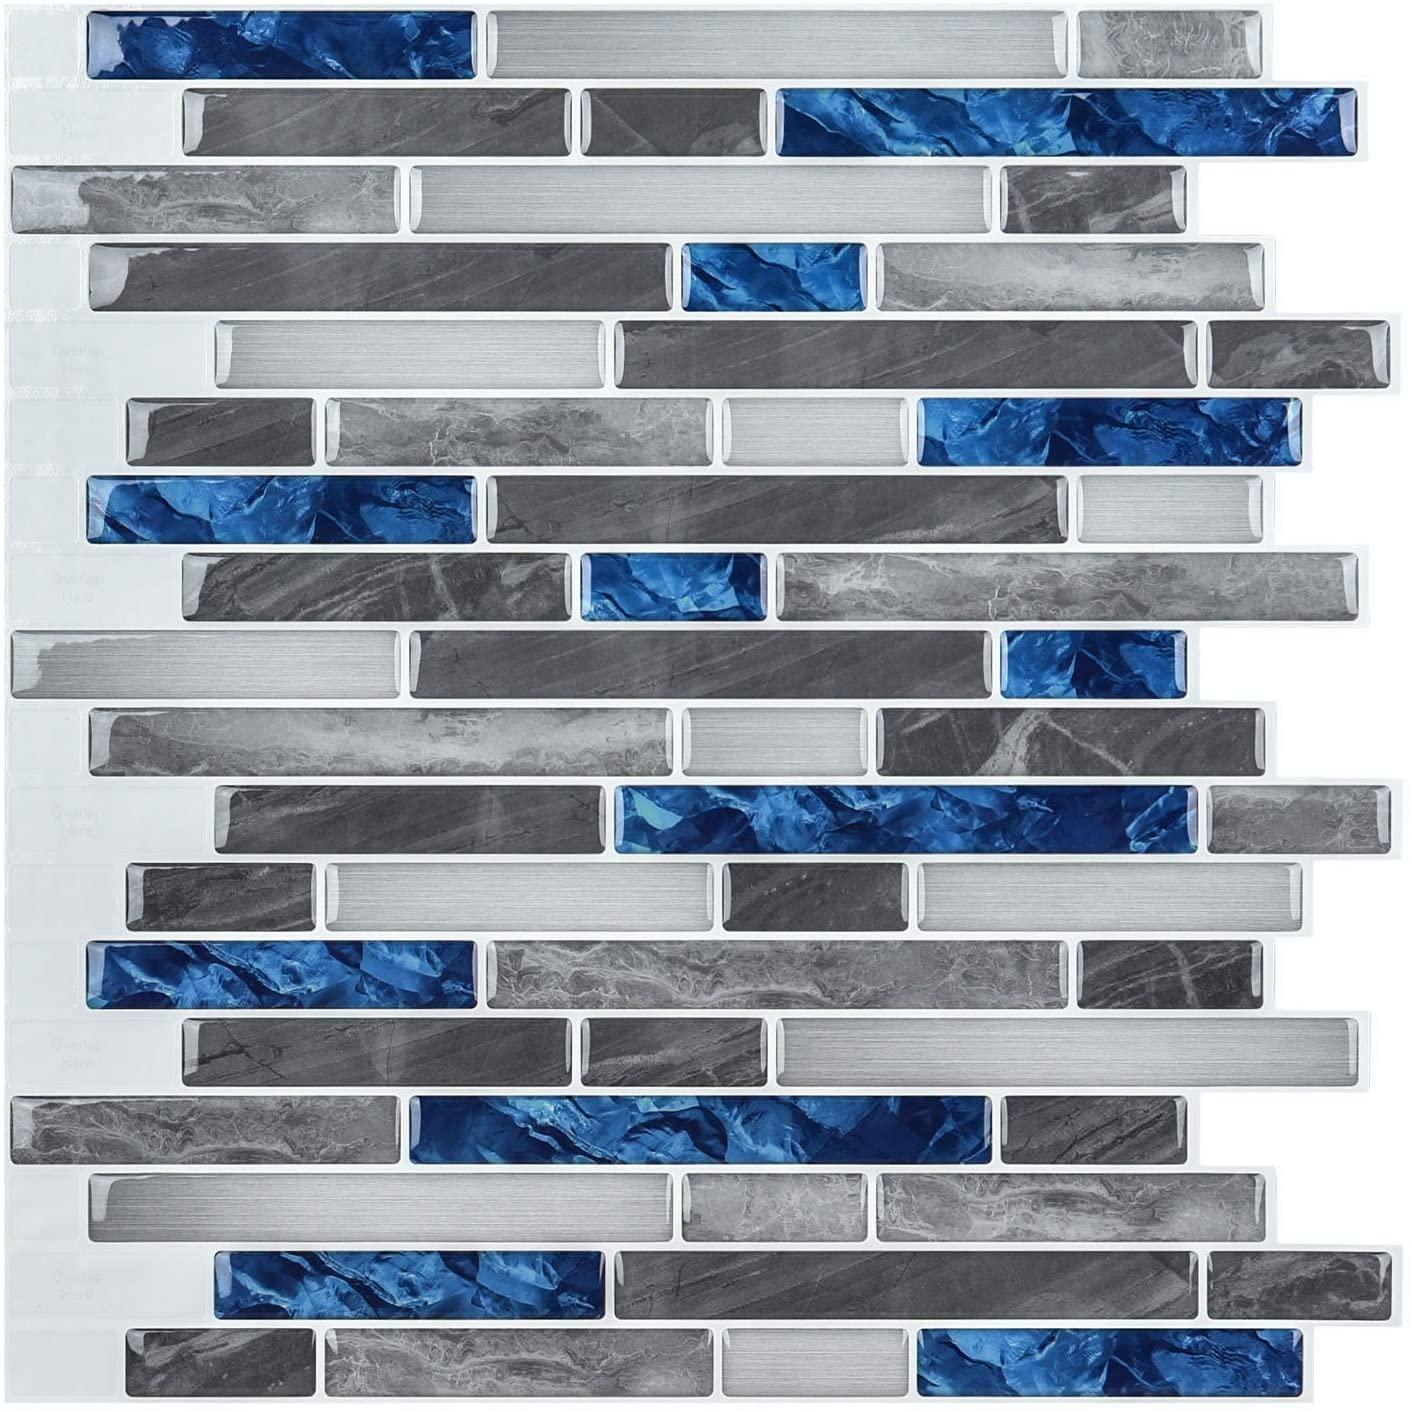 A17011 - Light 3D Mosaic Tile Peel and Stick Backsplash 10 Pieces 9.5 Sq.F